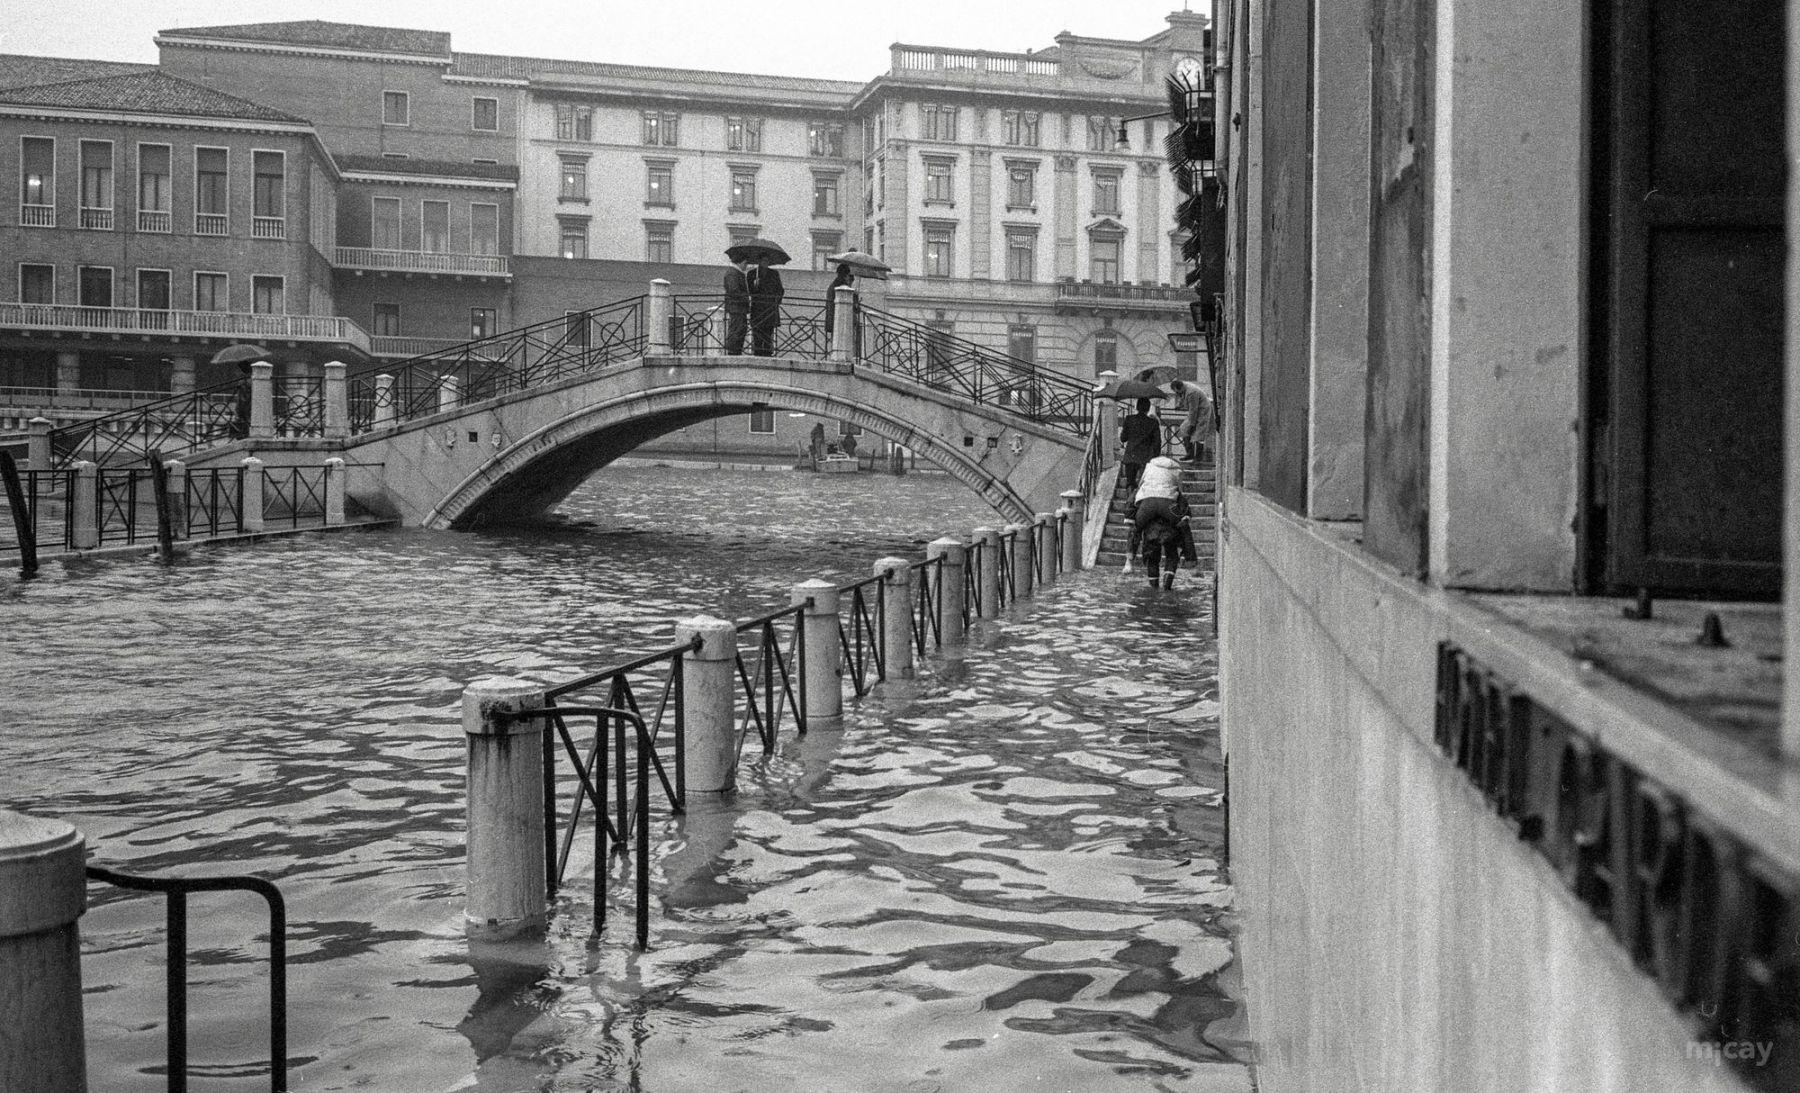 MichelAycaguer-Venise-AquaAlta-Noel-1981-13